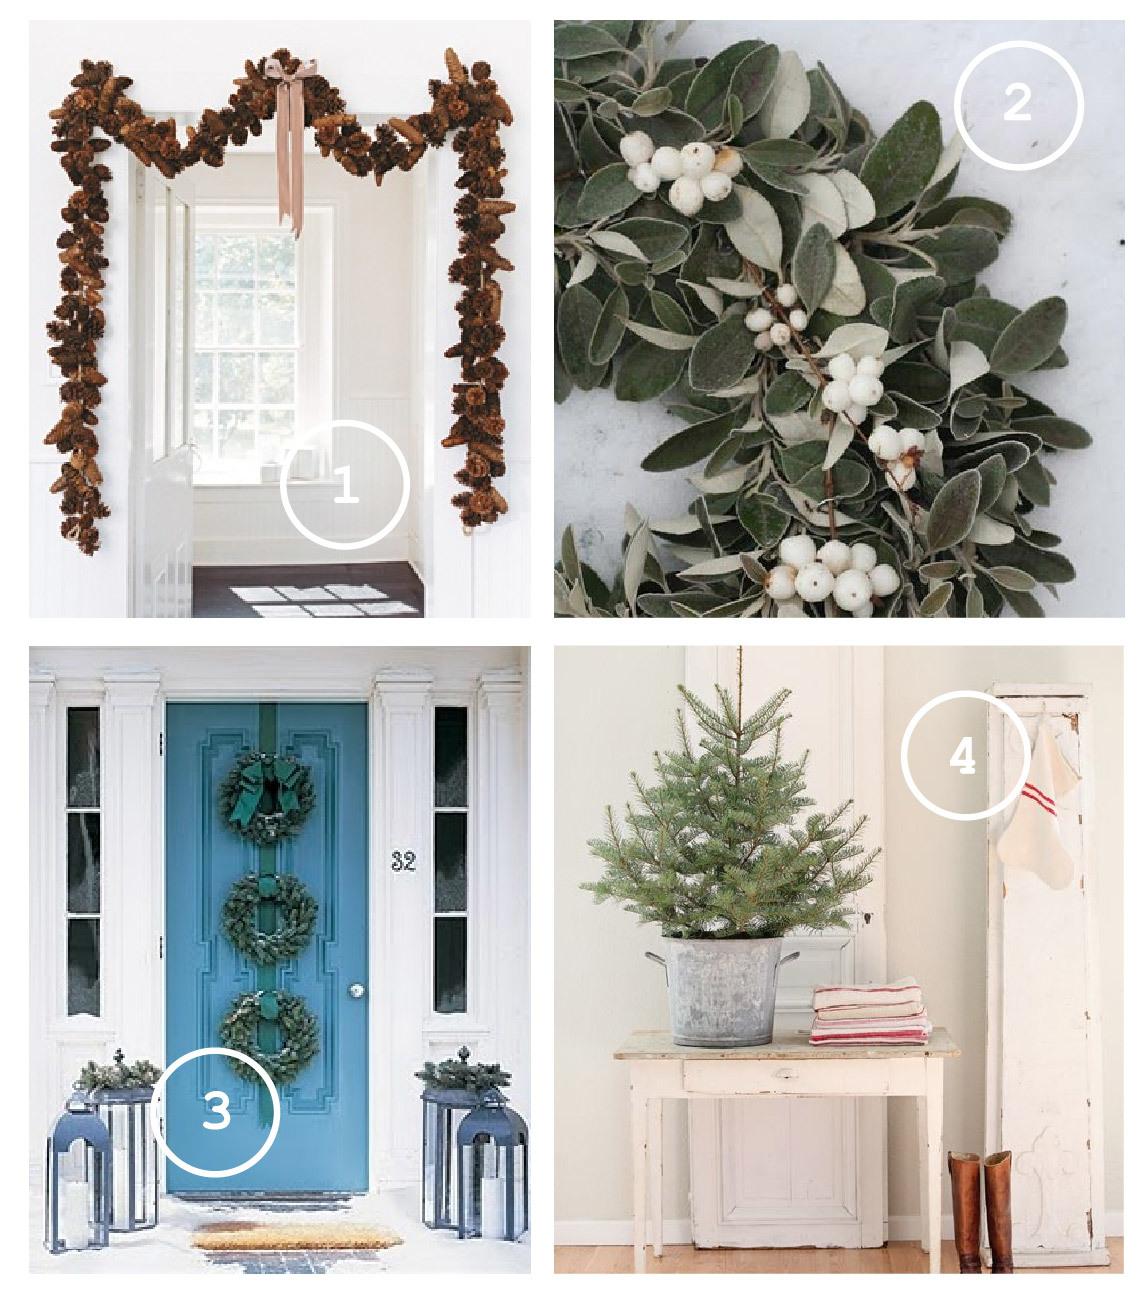 2013 favorite winter decorations